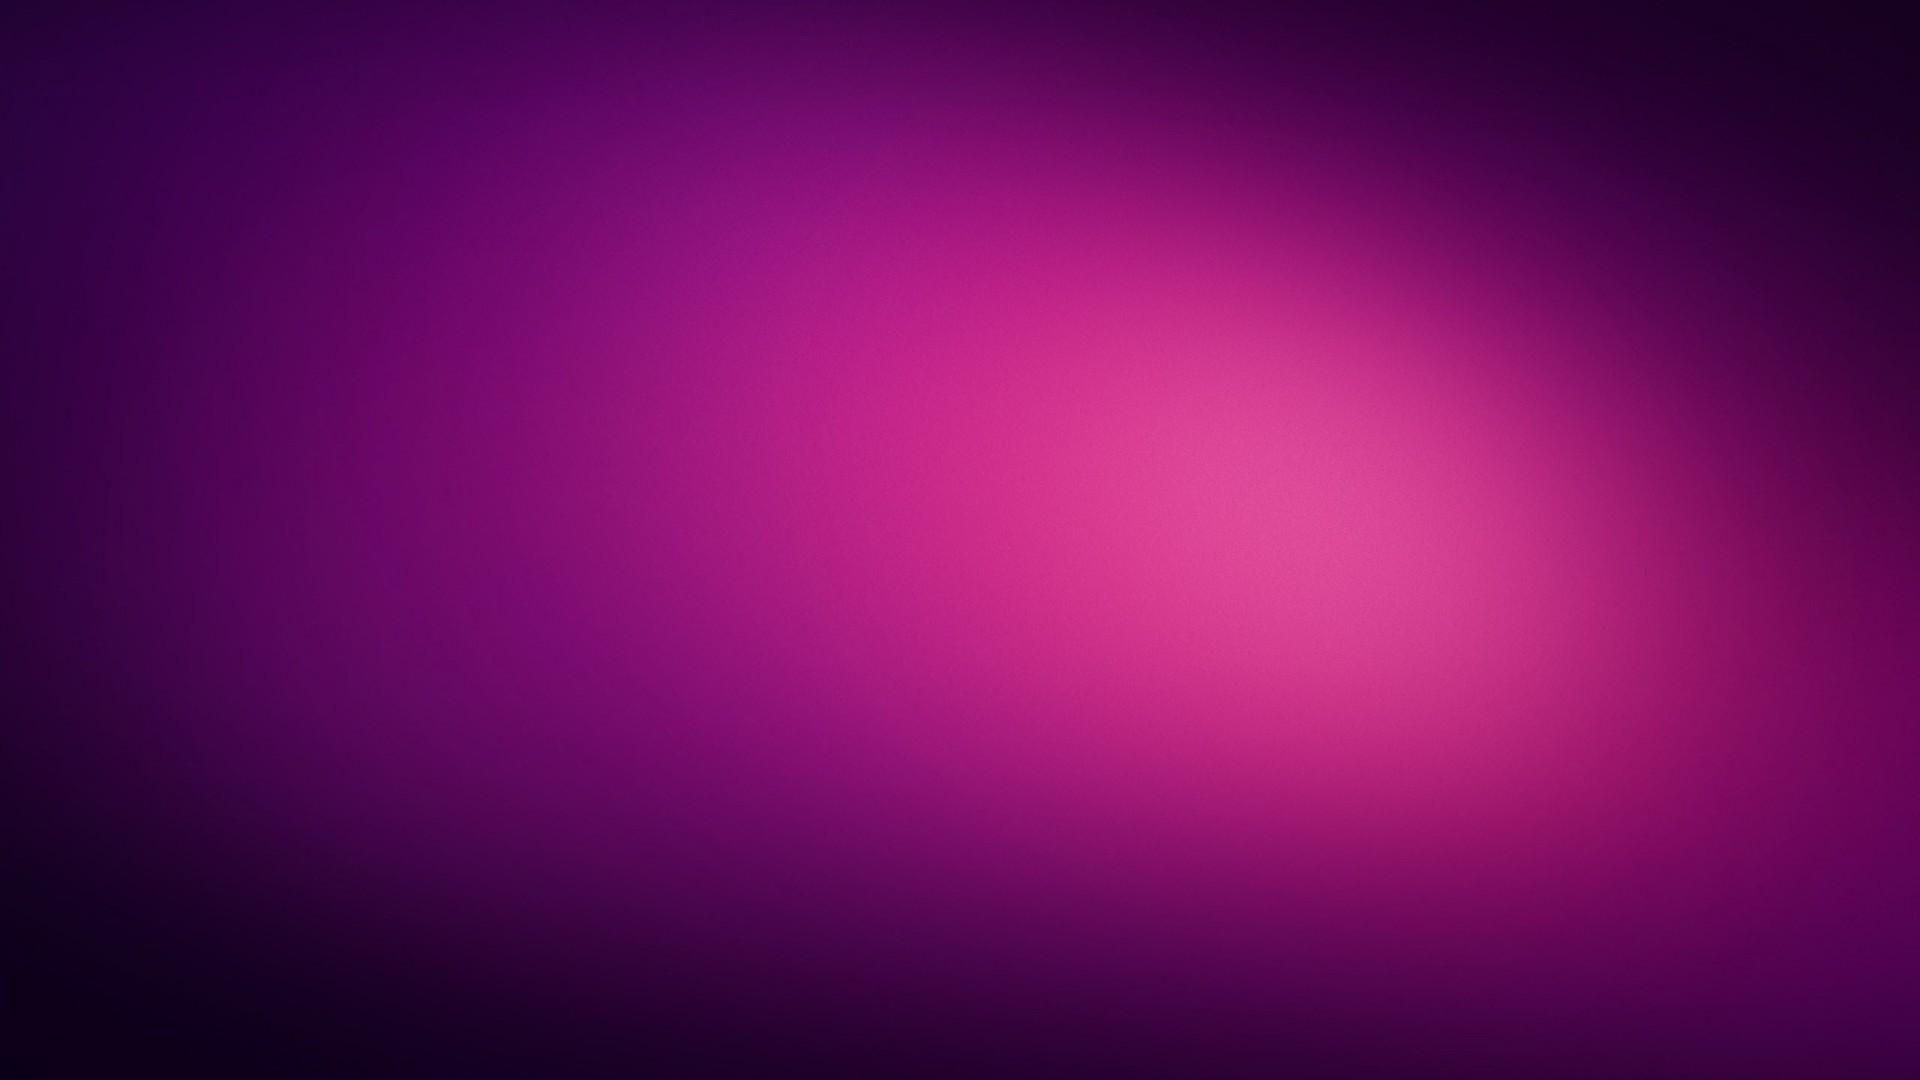 Breast Cancer Desktop Wallpaper 183 ① Wallpapertag